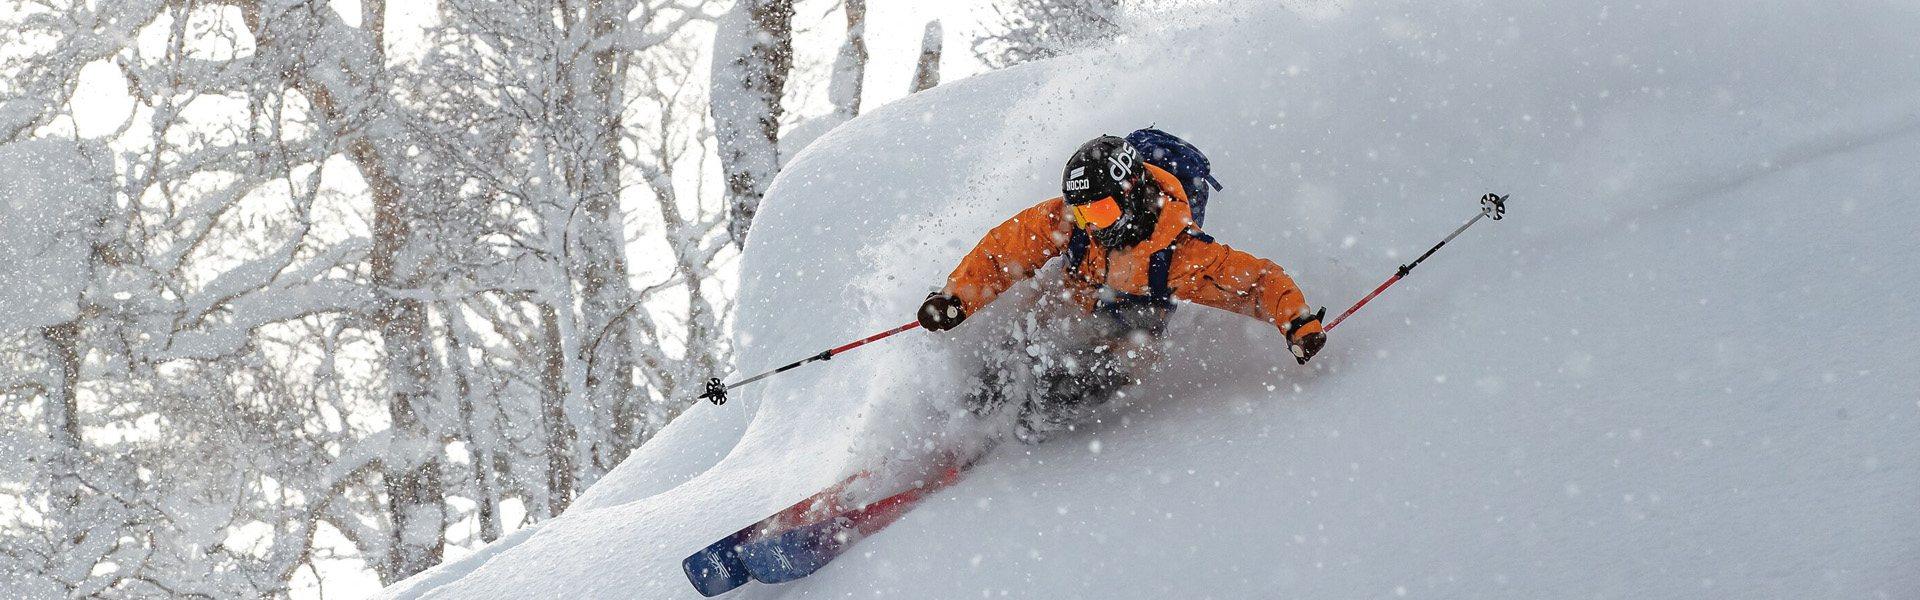 Gear Up for Ski Season